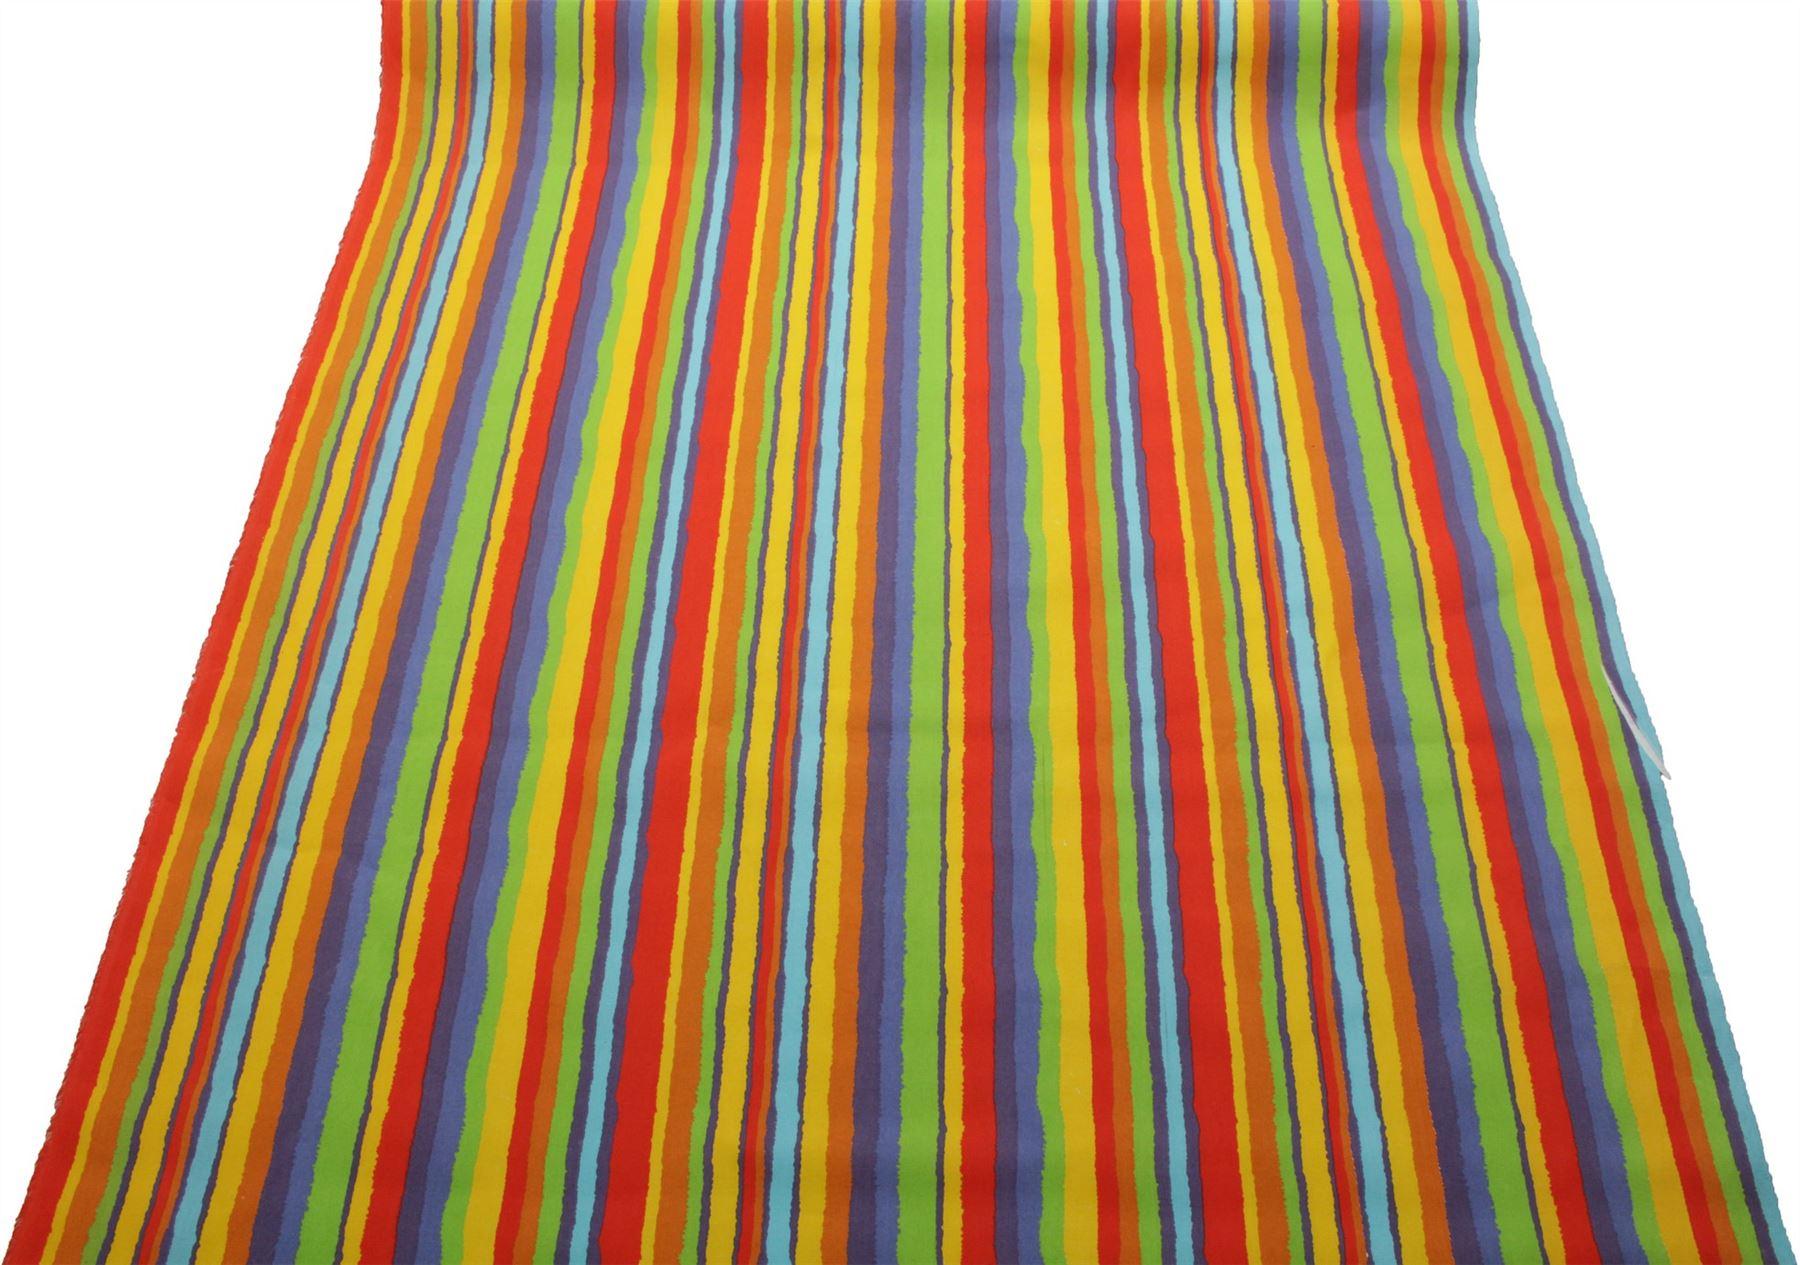 thumbnail 67 - 100% Heavy Cotton Panama Printed Childrens Curtain Cushion Upholstery Fabric